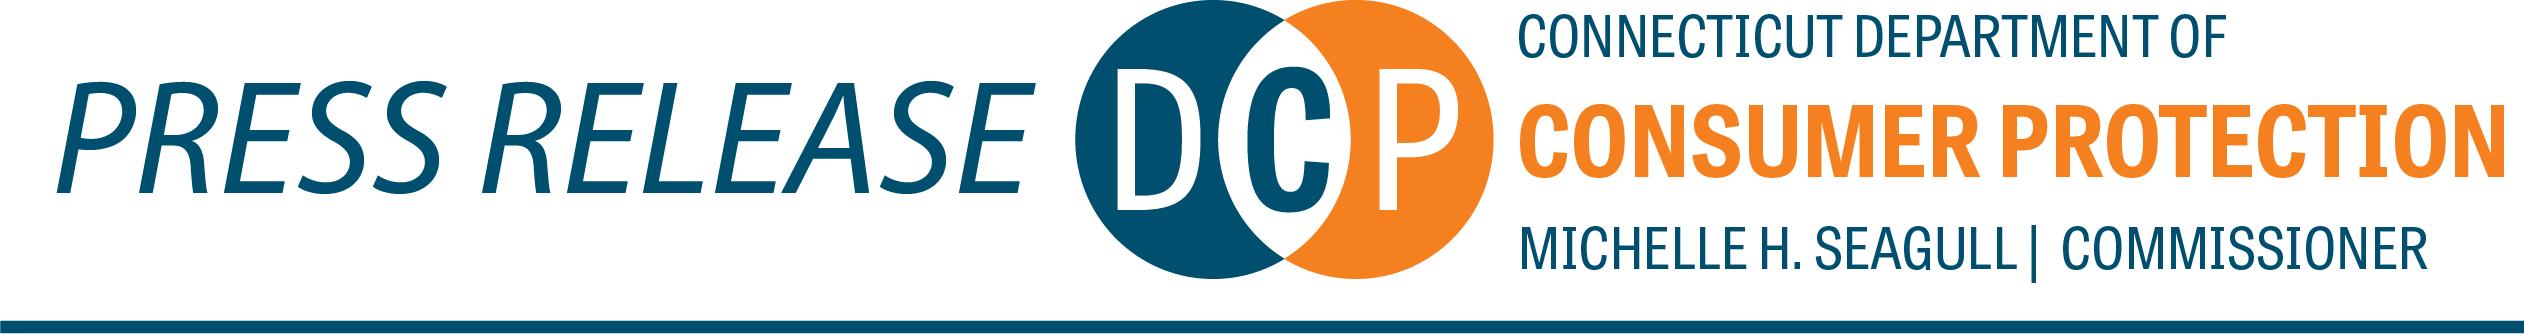 DCP Press Release Header